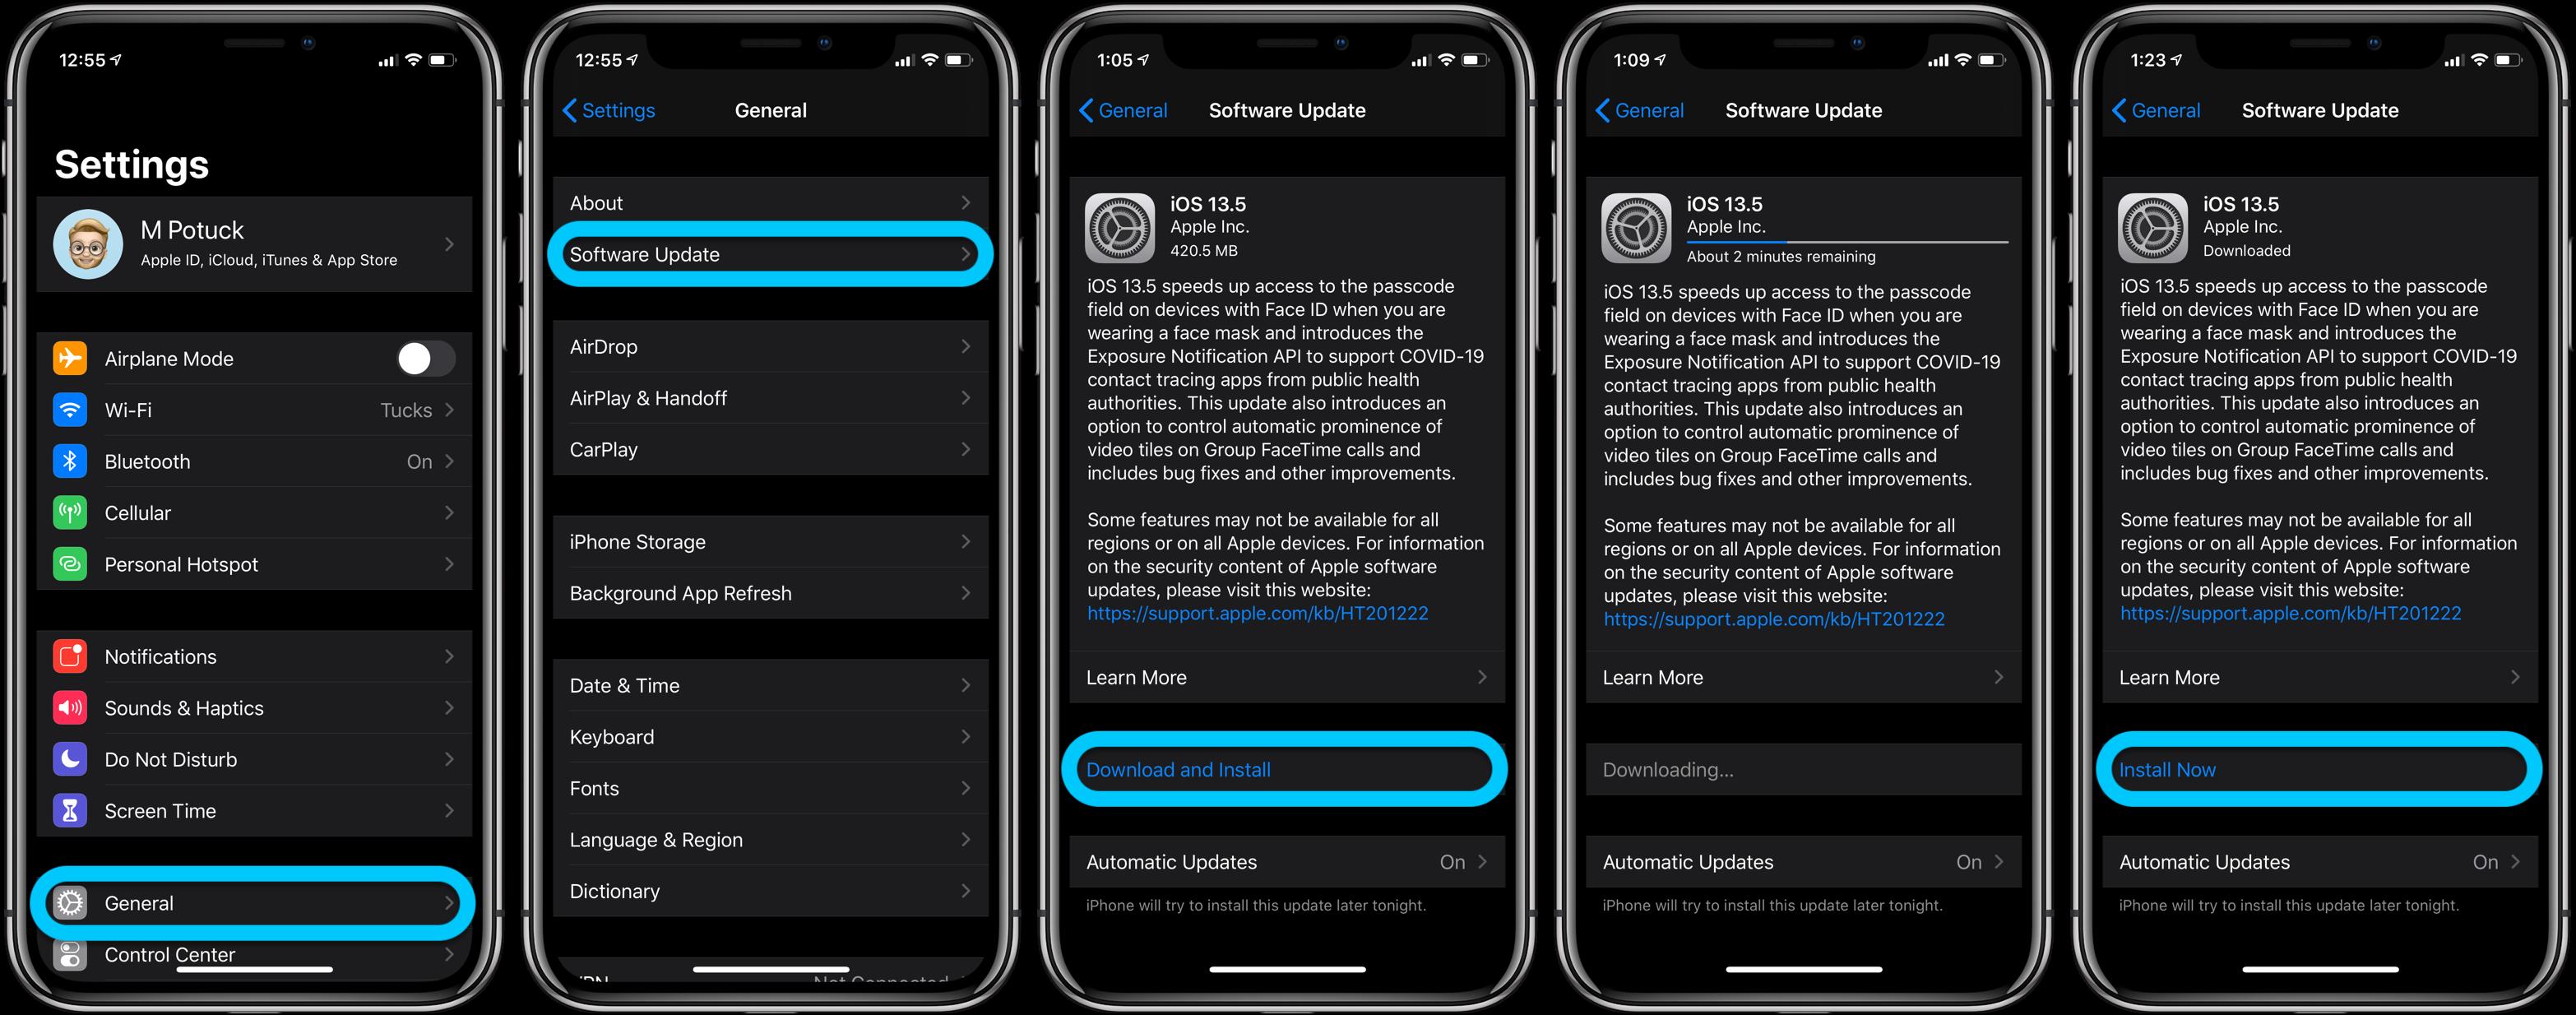 Comment installer l'iPhone iOS 13.5